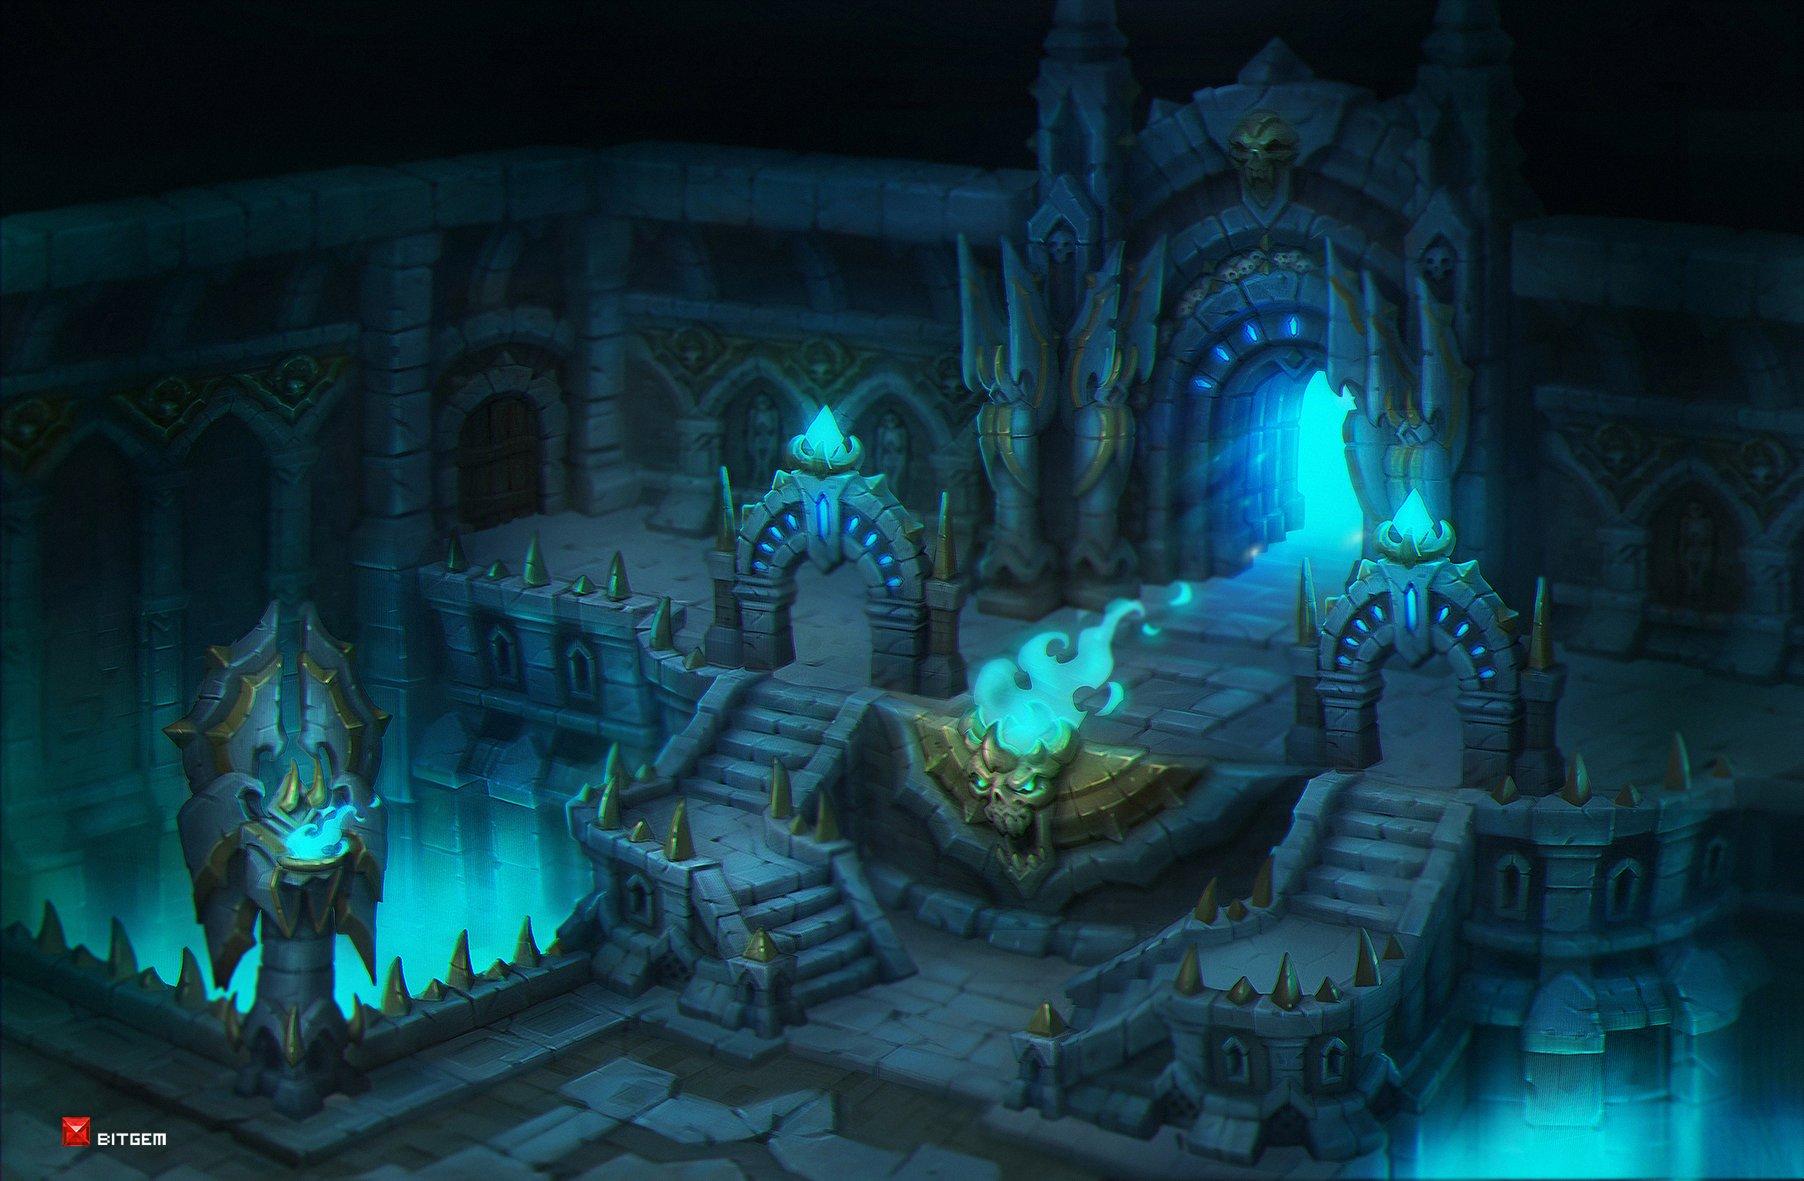 ArtStation  Dungeon 2 Dmitry Barbashin